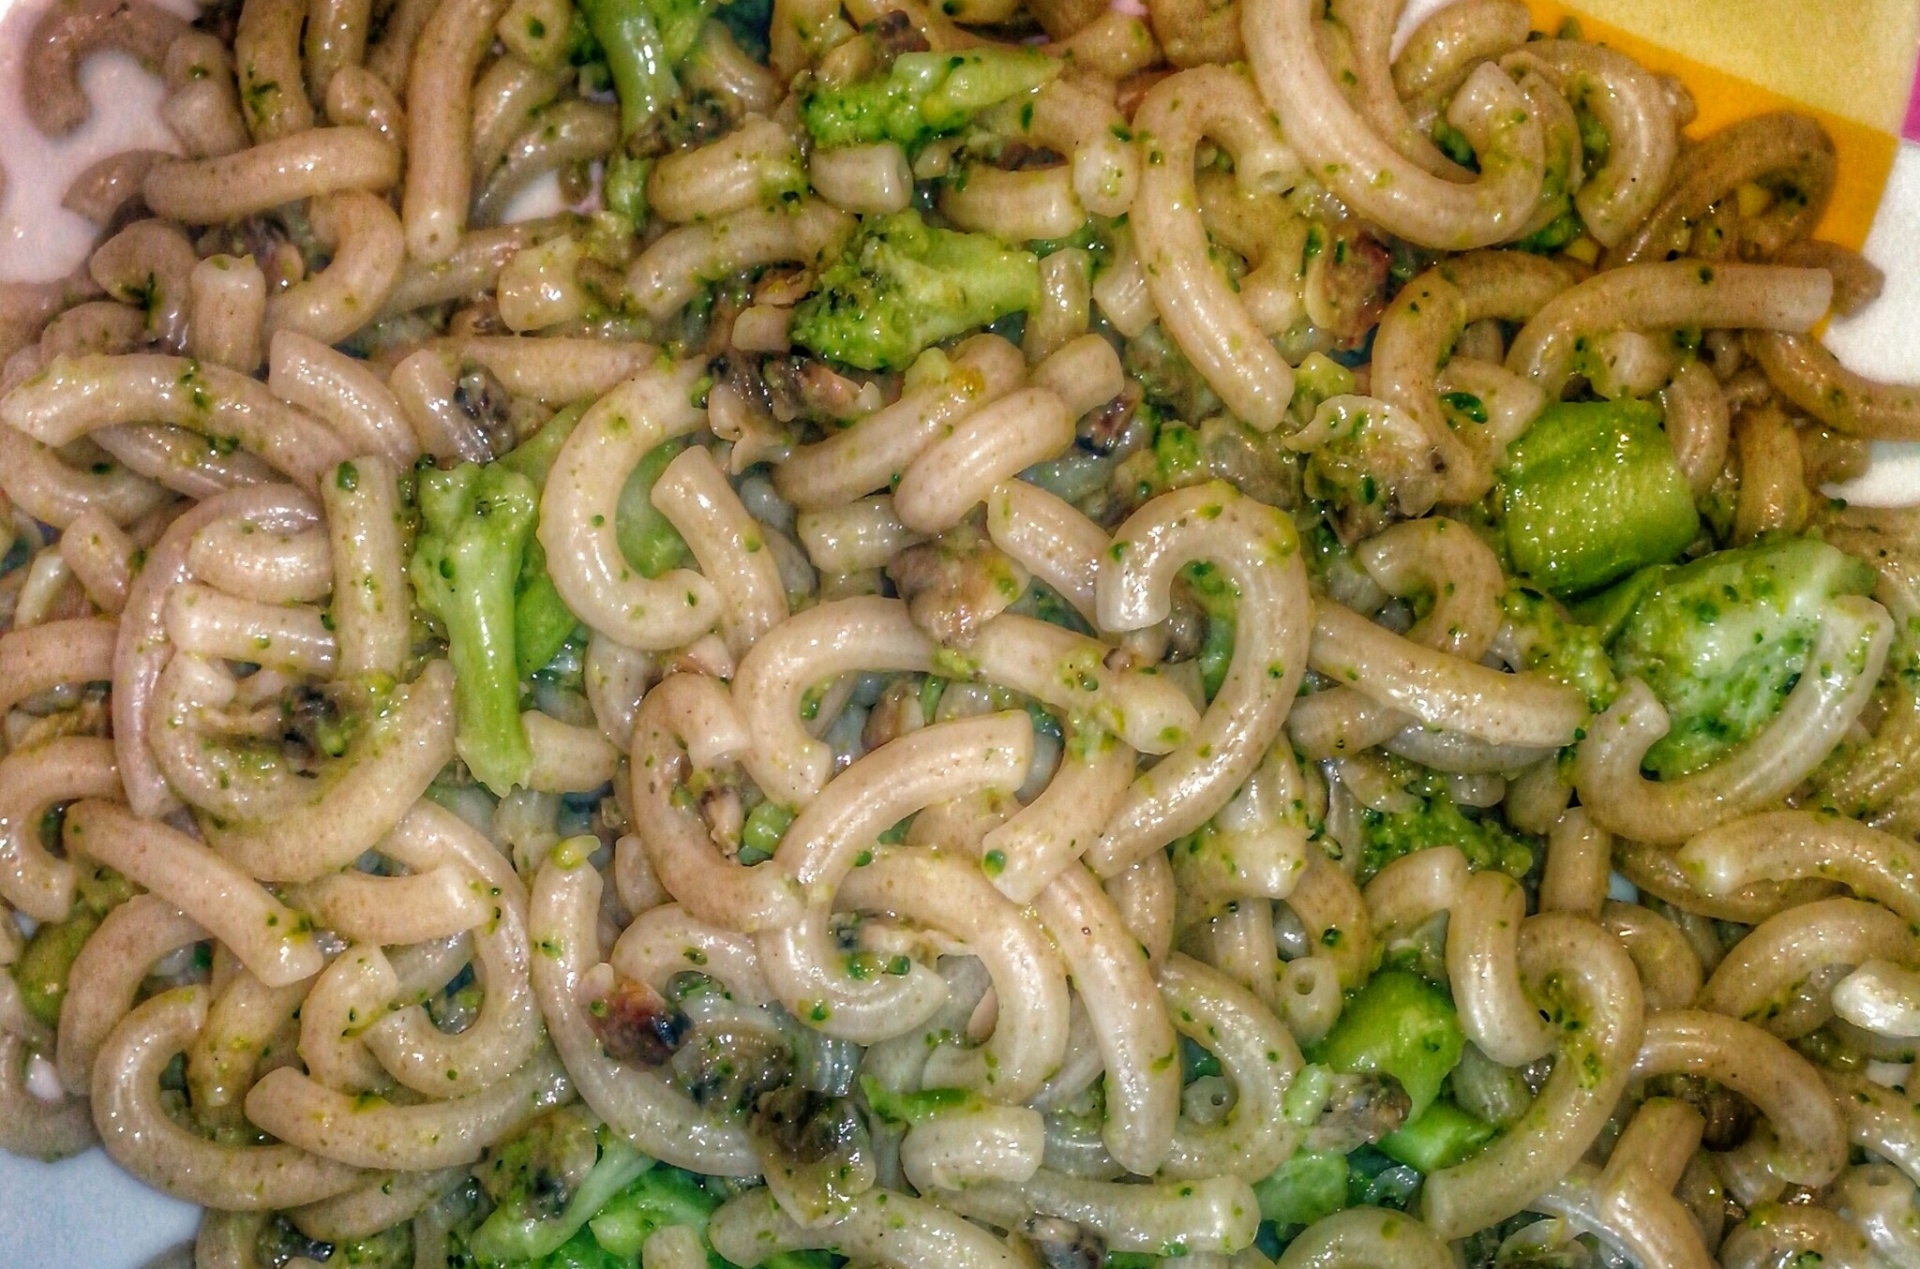 gramigna con broccoli